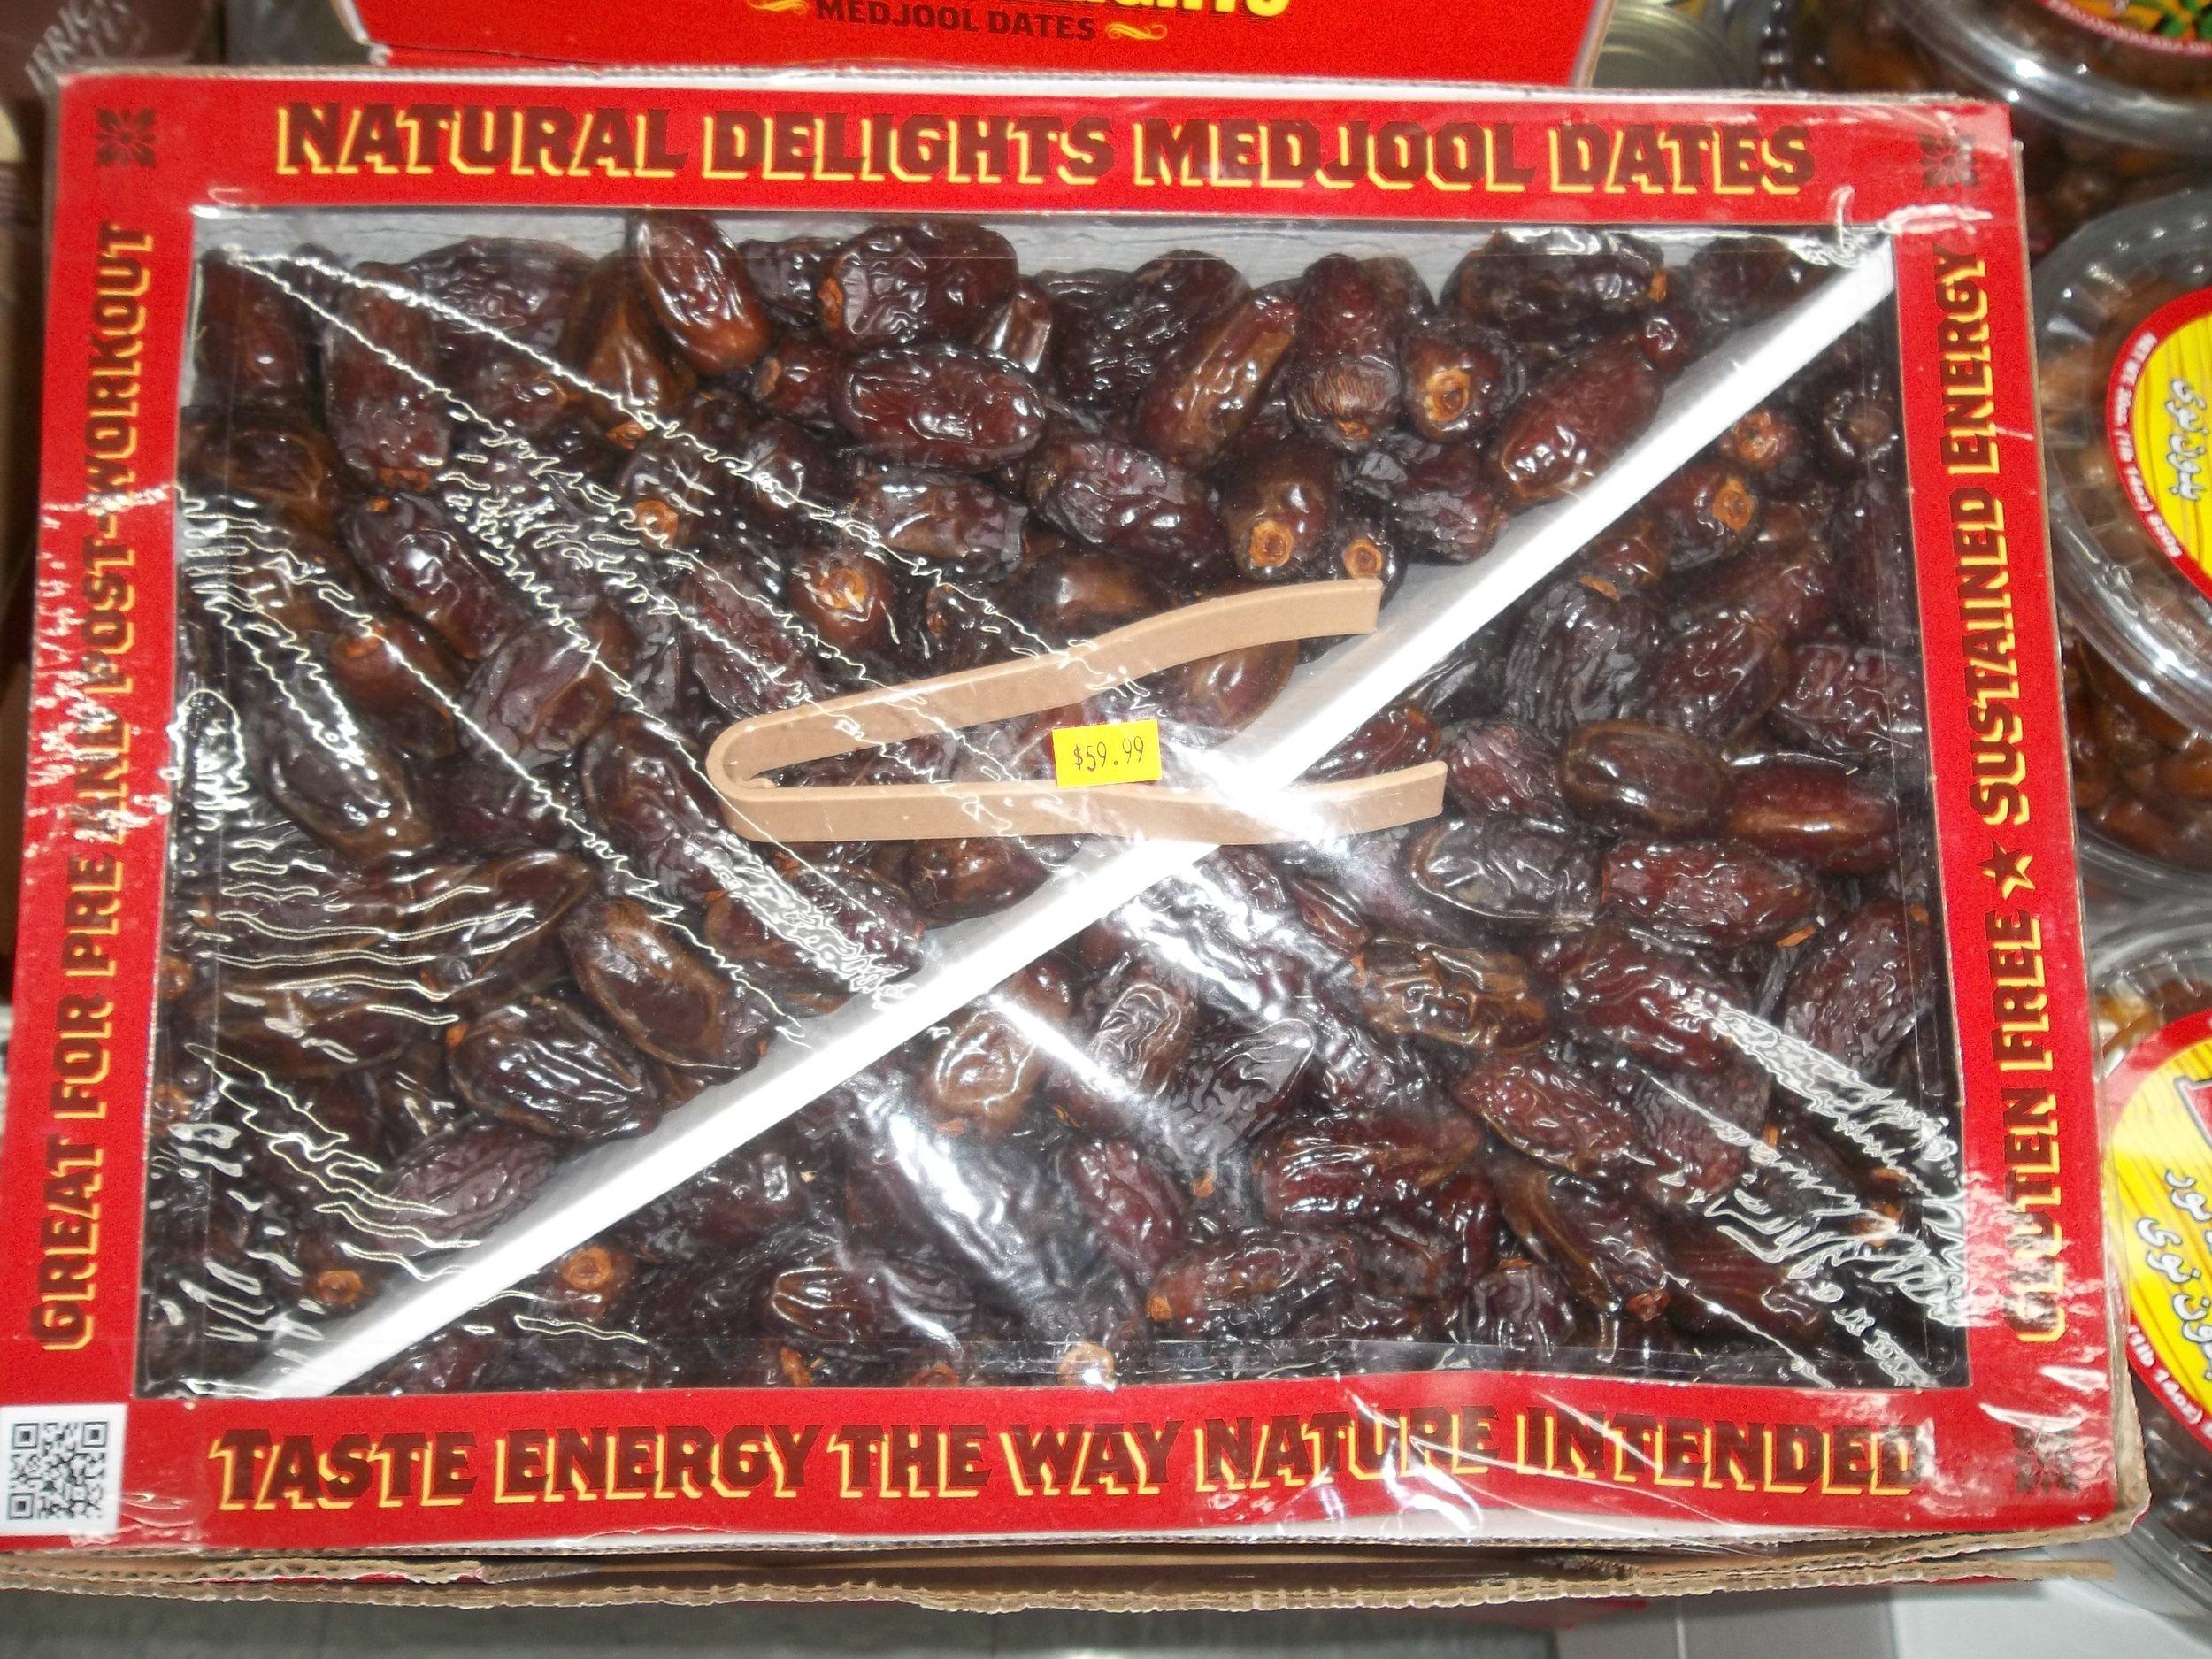 Medjool-Dates-Pak-Halal-12259-W-87th-St-Parkway-Lenexa-KS-66215.JPG